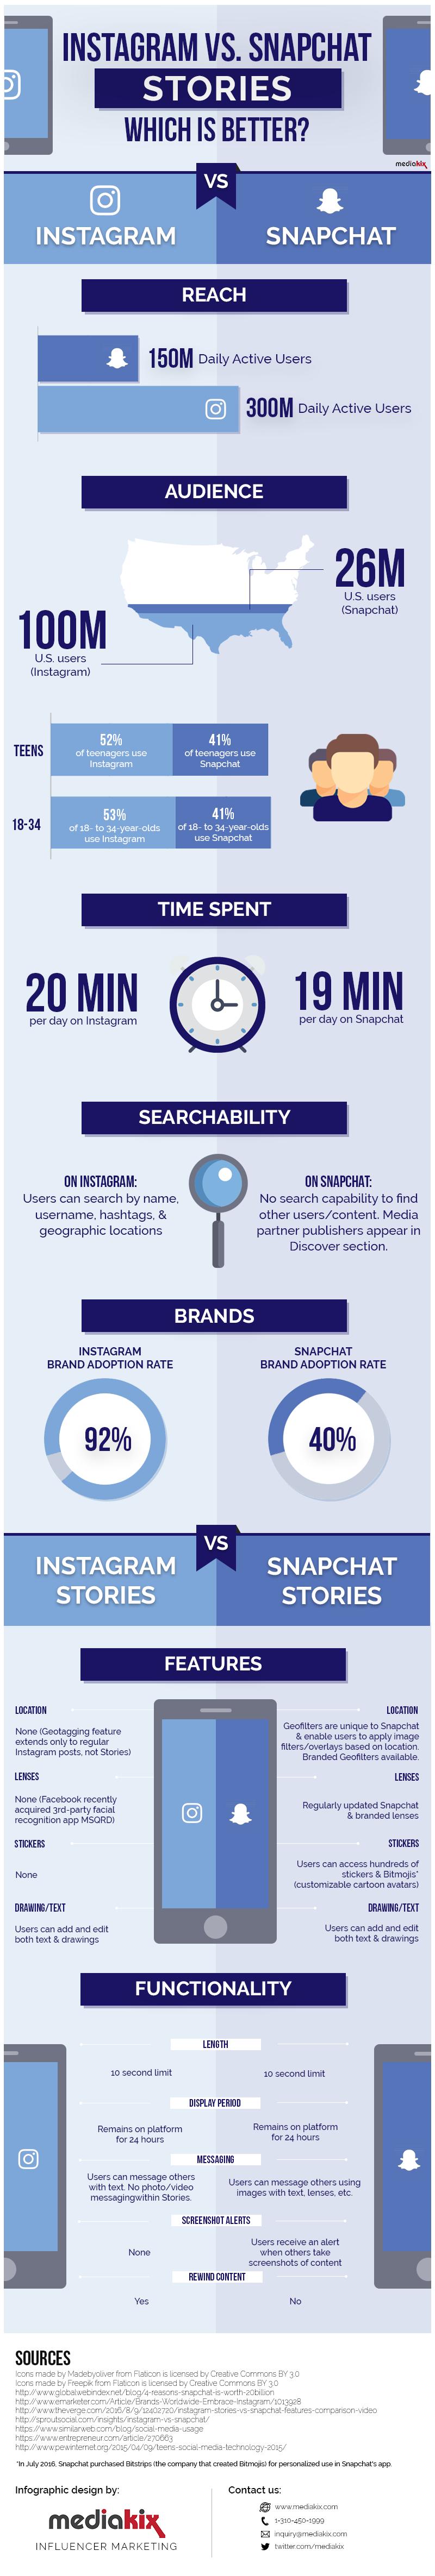 instagram-vs-snapchat-stories-infographic-best-social-media1